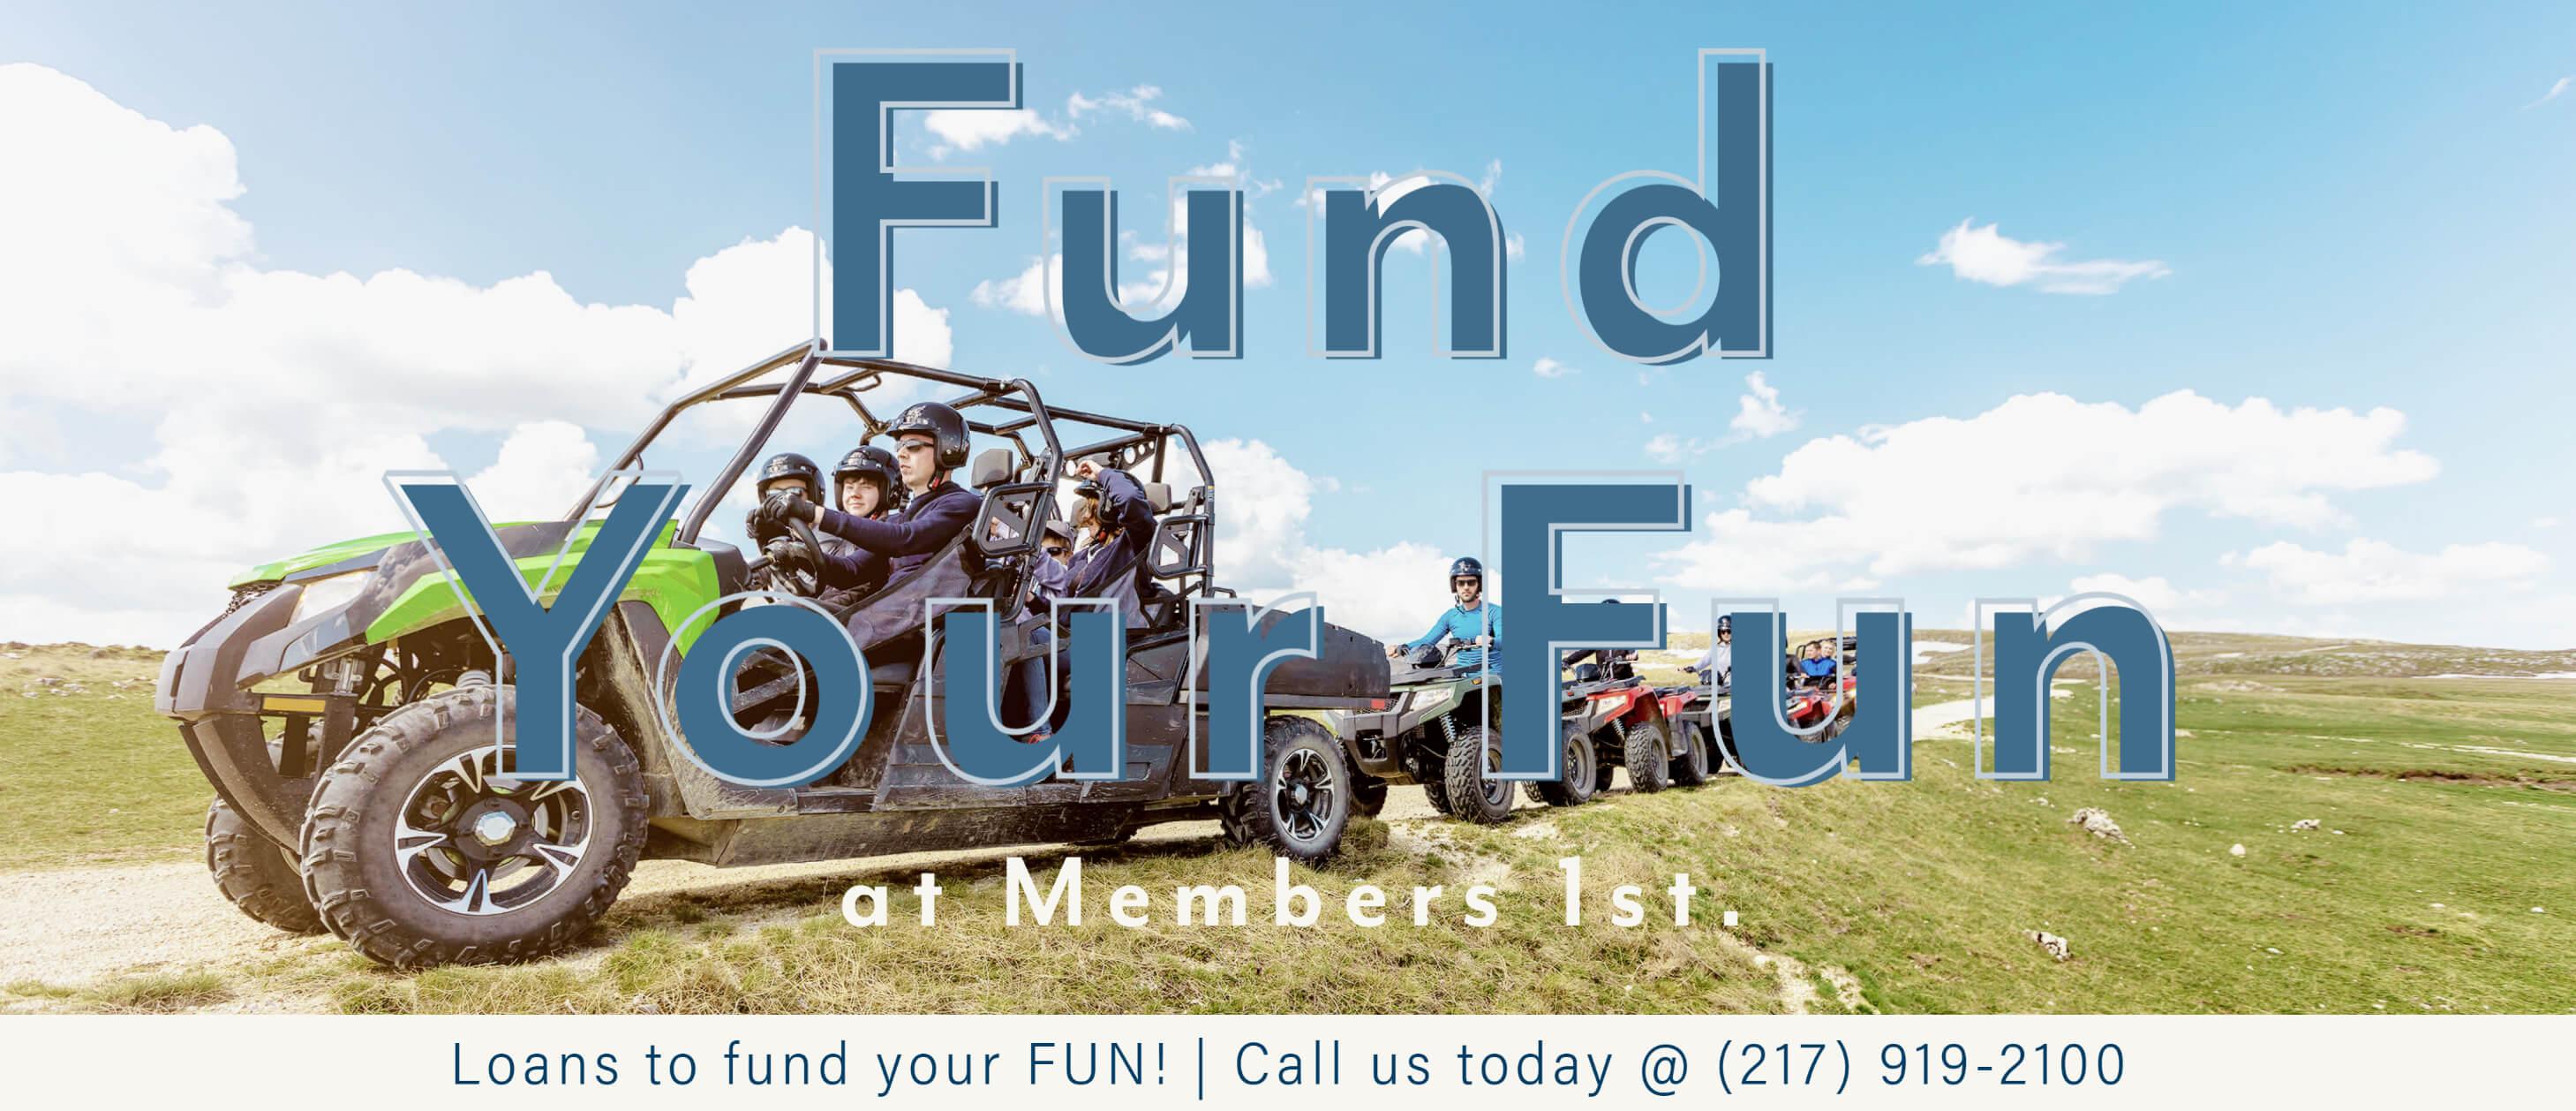 Fund Your Fun